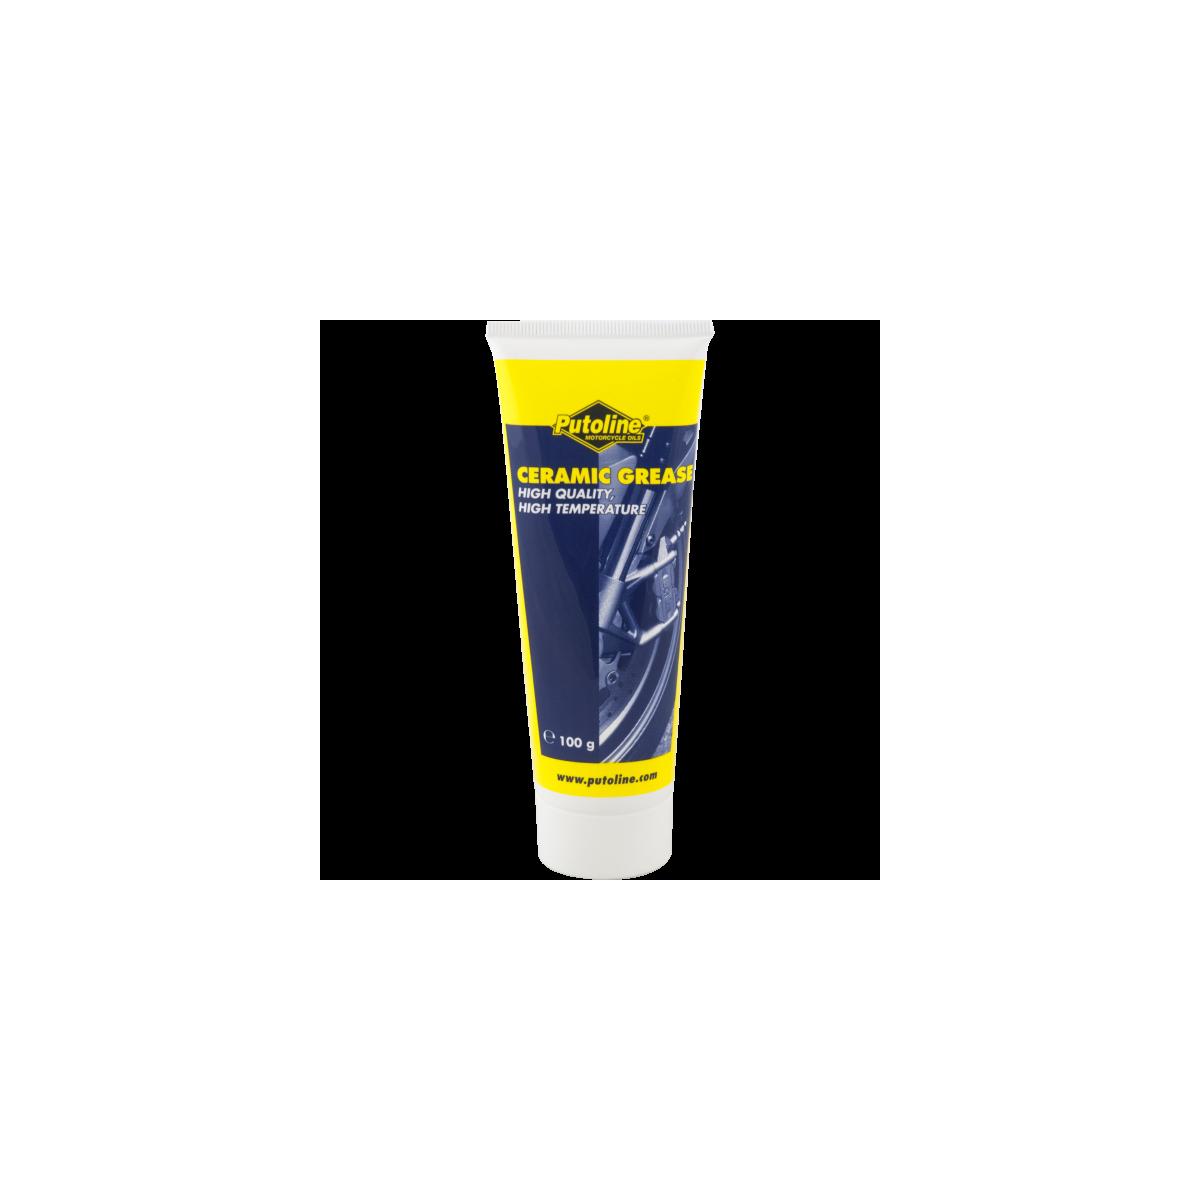 Graisse multi-usage ceramic hautes températures Putoline en 100 grs